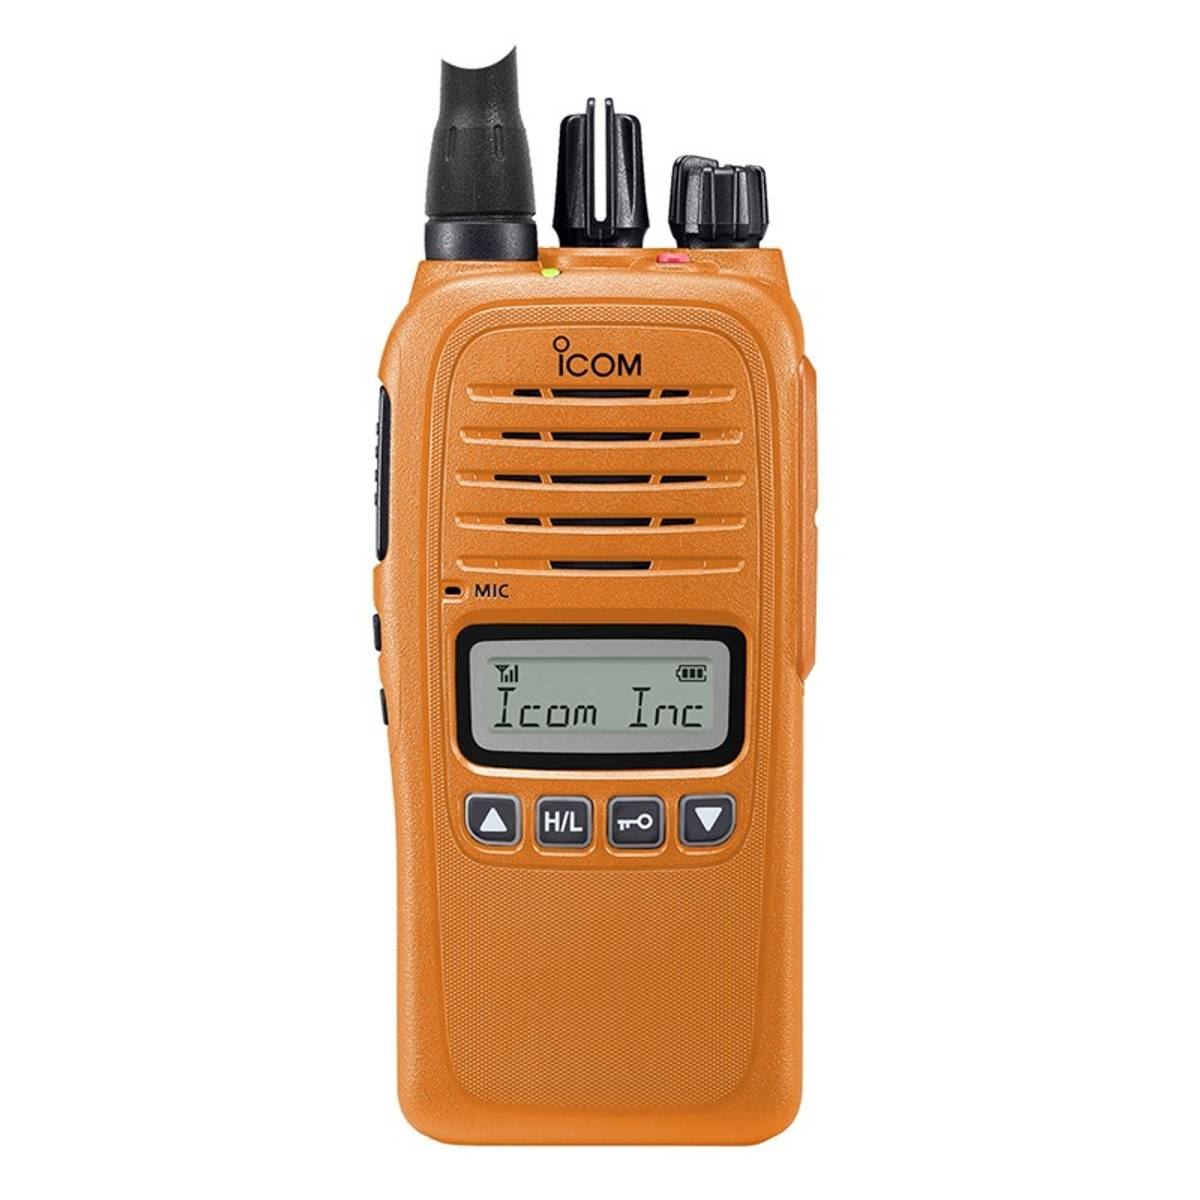 Icom ProHunt 2 Compact - Orange jaktpakke #NOR, inkl. eske, bat